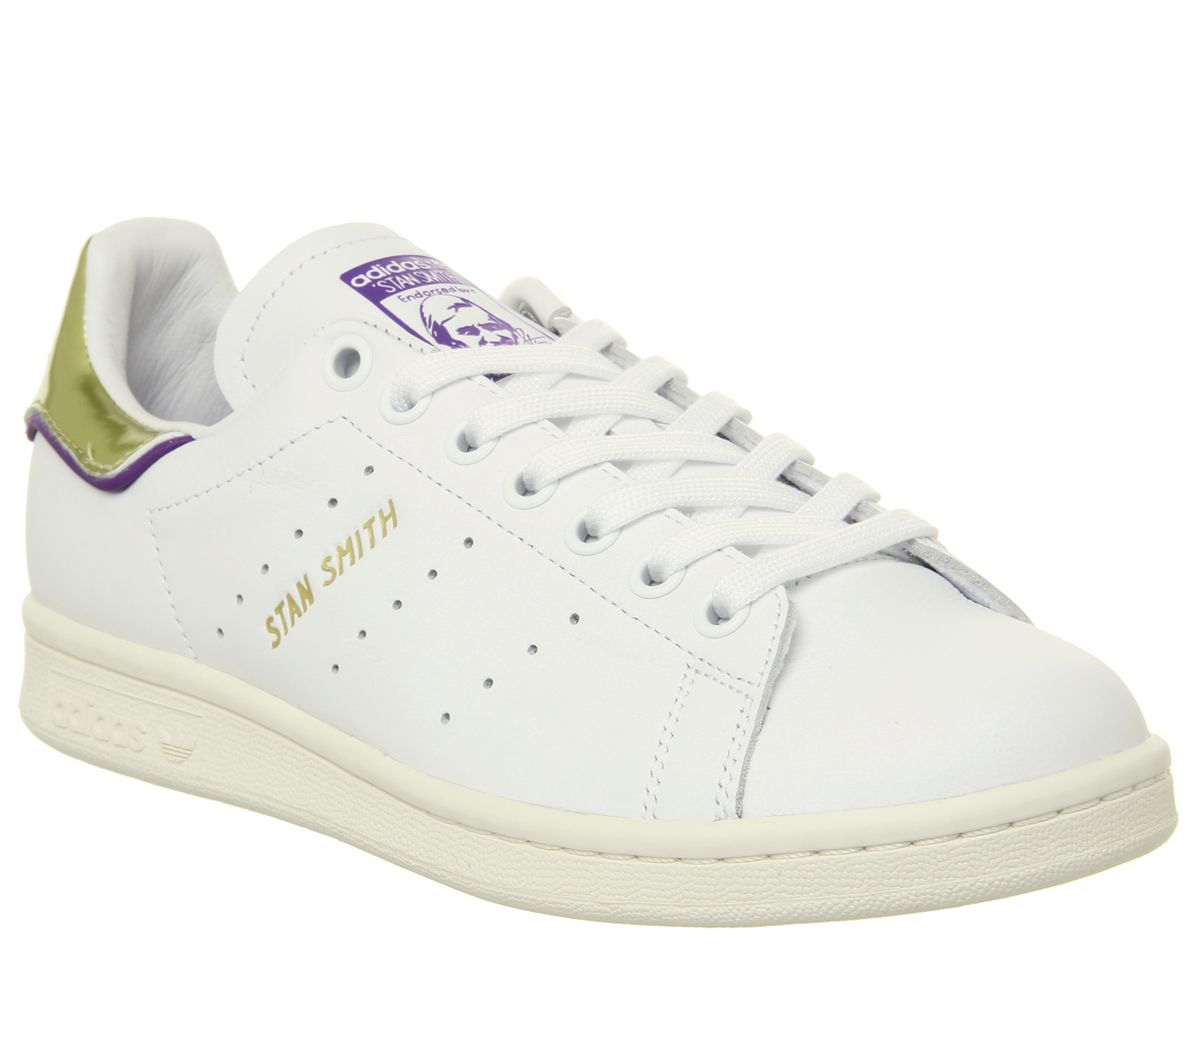 adidas stan smith or